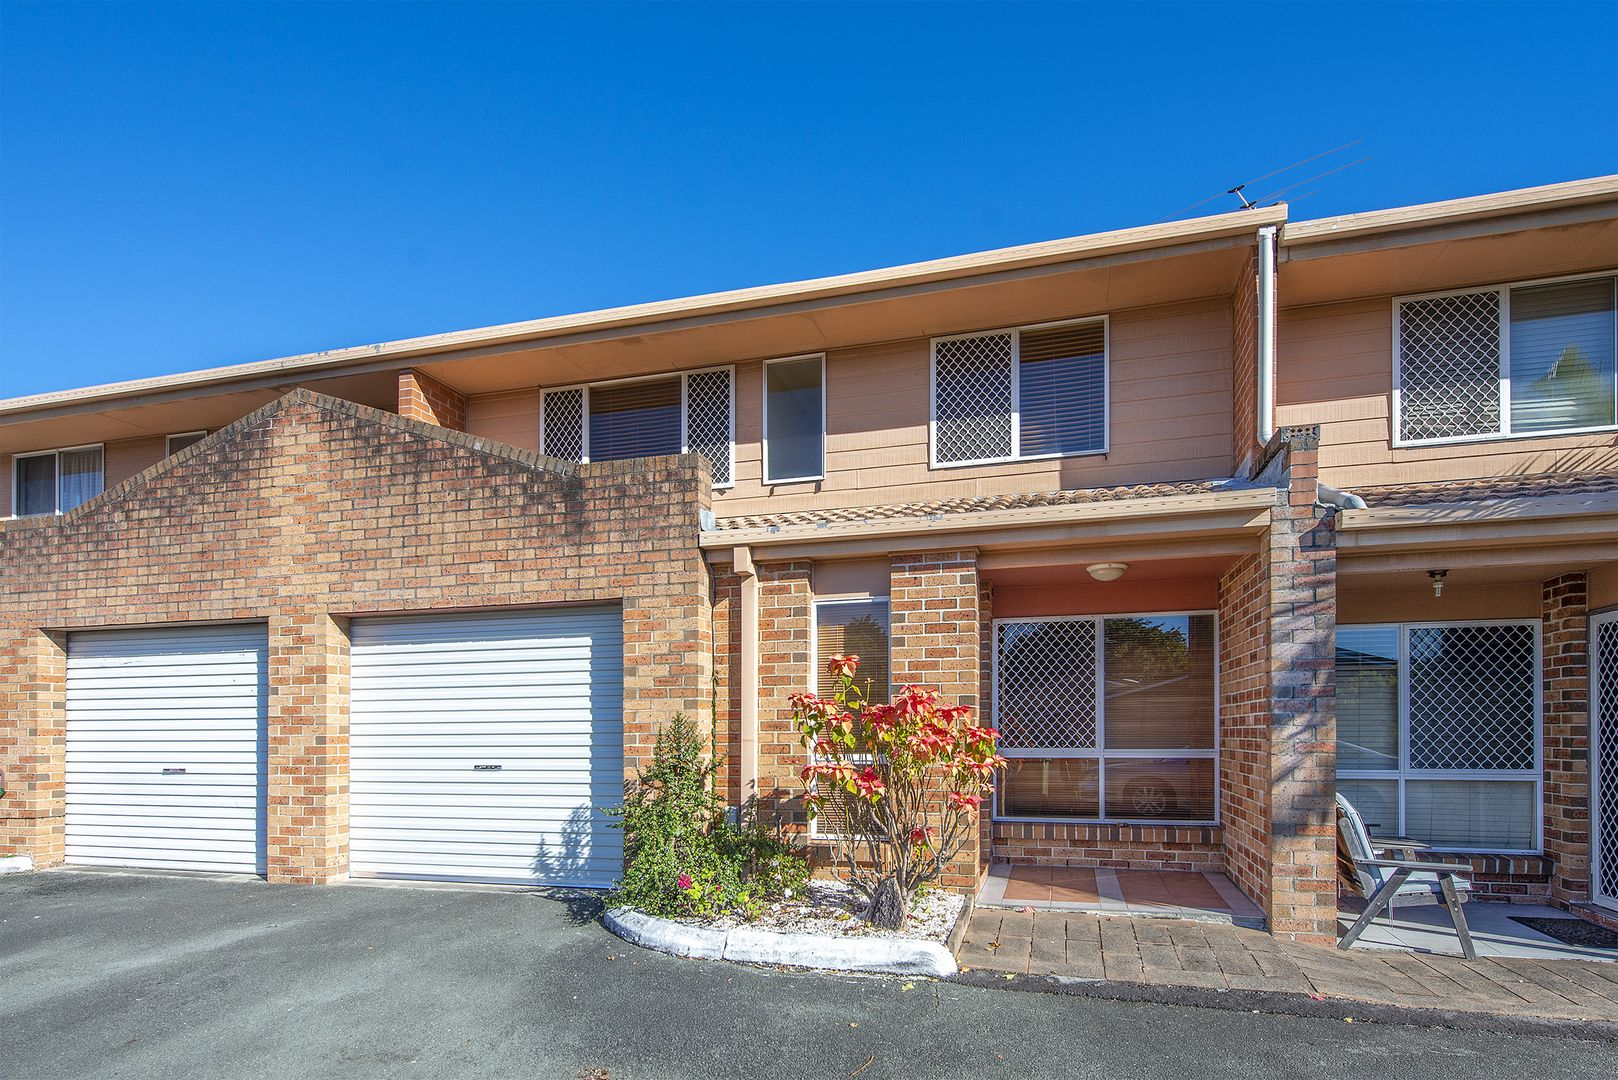 3/41 Chatswood Road, Daisy Hill QLD 4127, Image 1